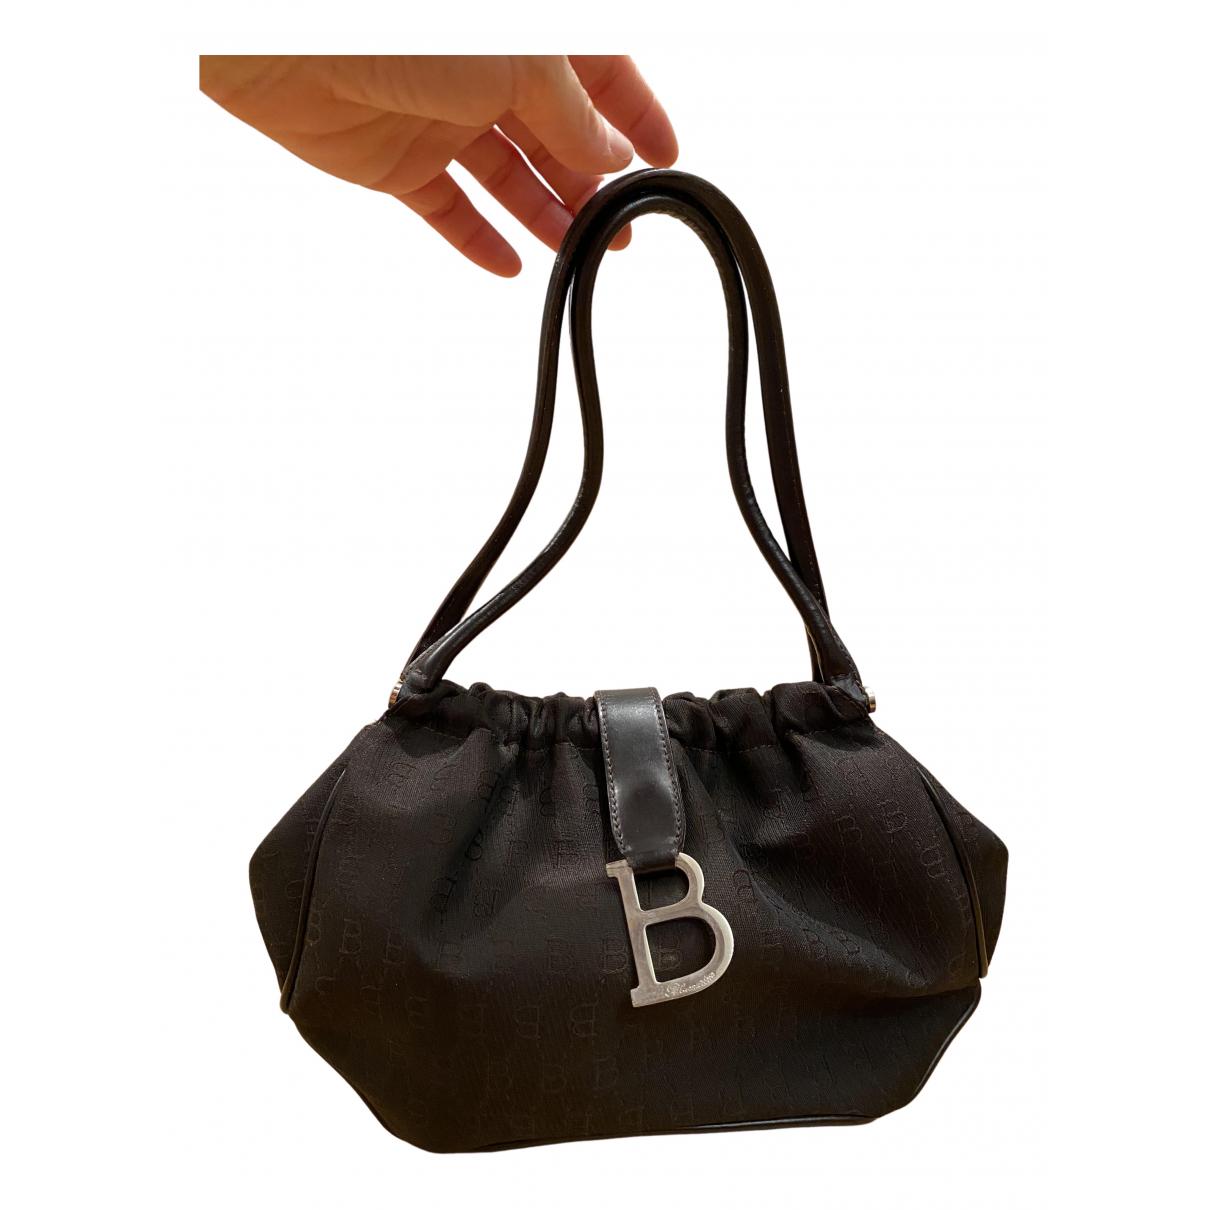 Blumarine - Sac a main   pour femme en coton - marron